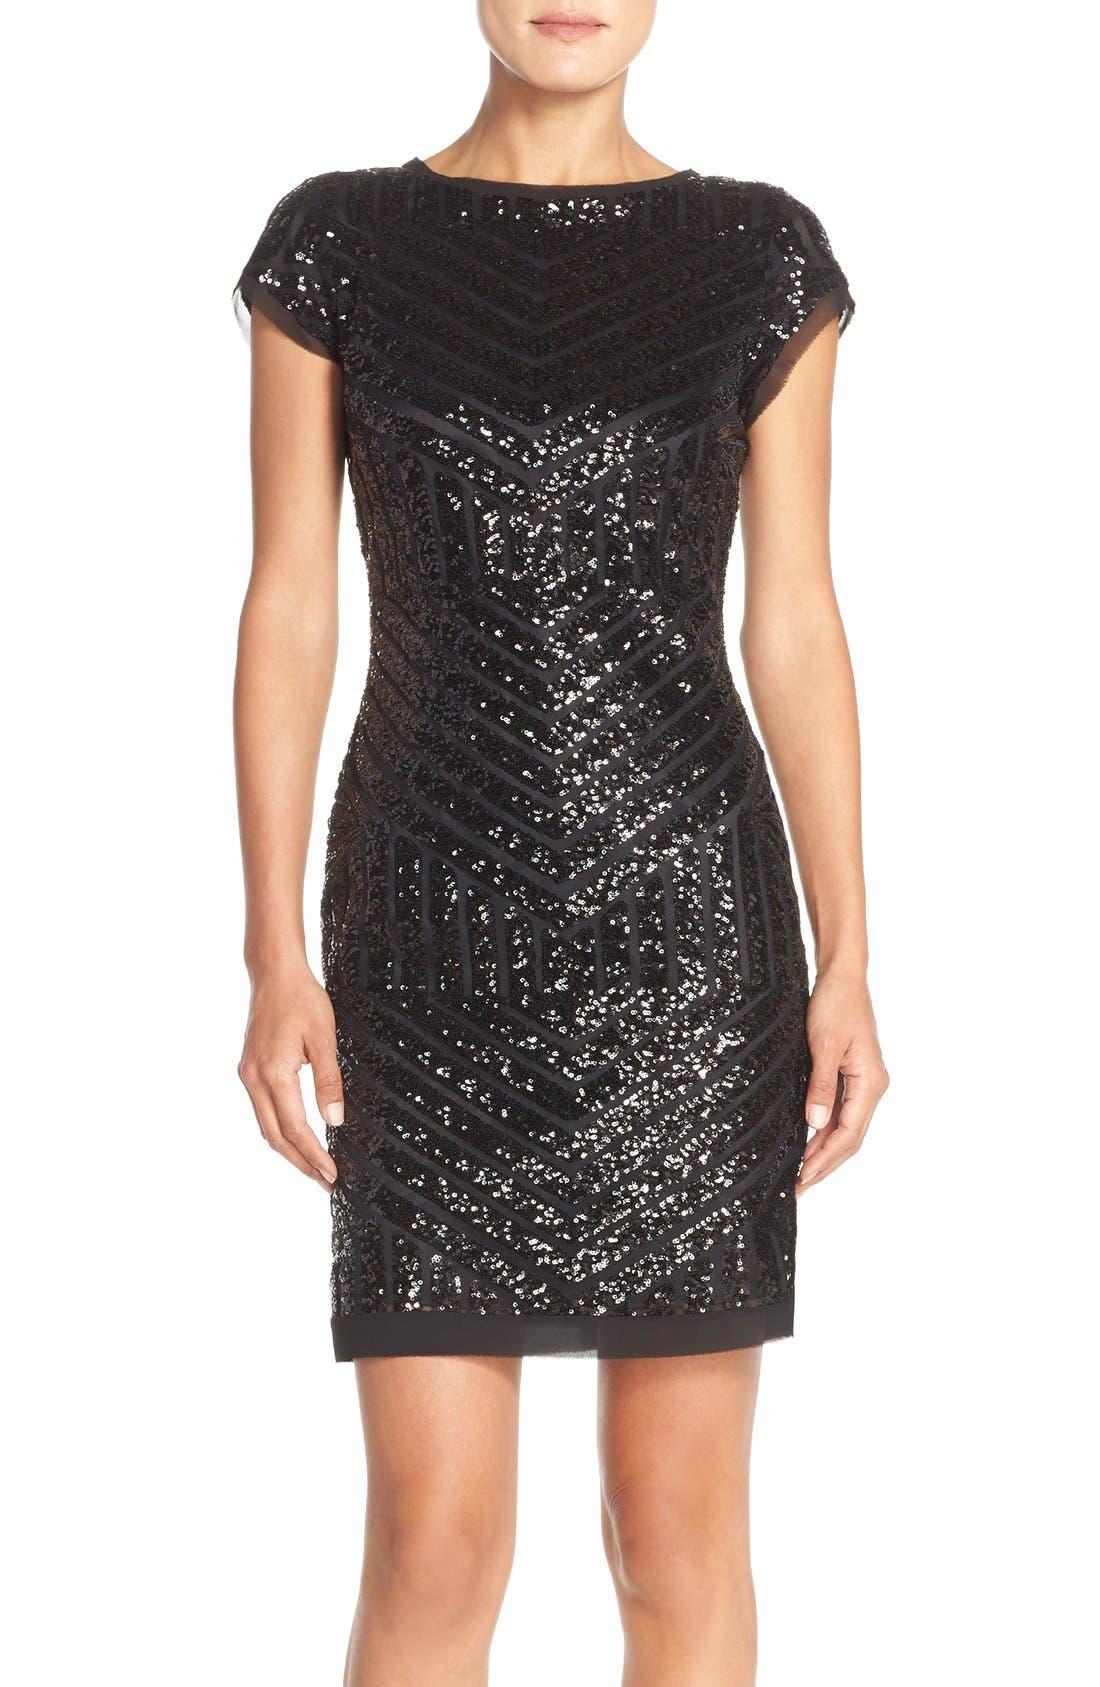 Alternate Image 1 Selected - Vince Camuto Chevron Sequin Sheath Dress (Regular & Petite)